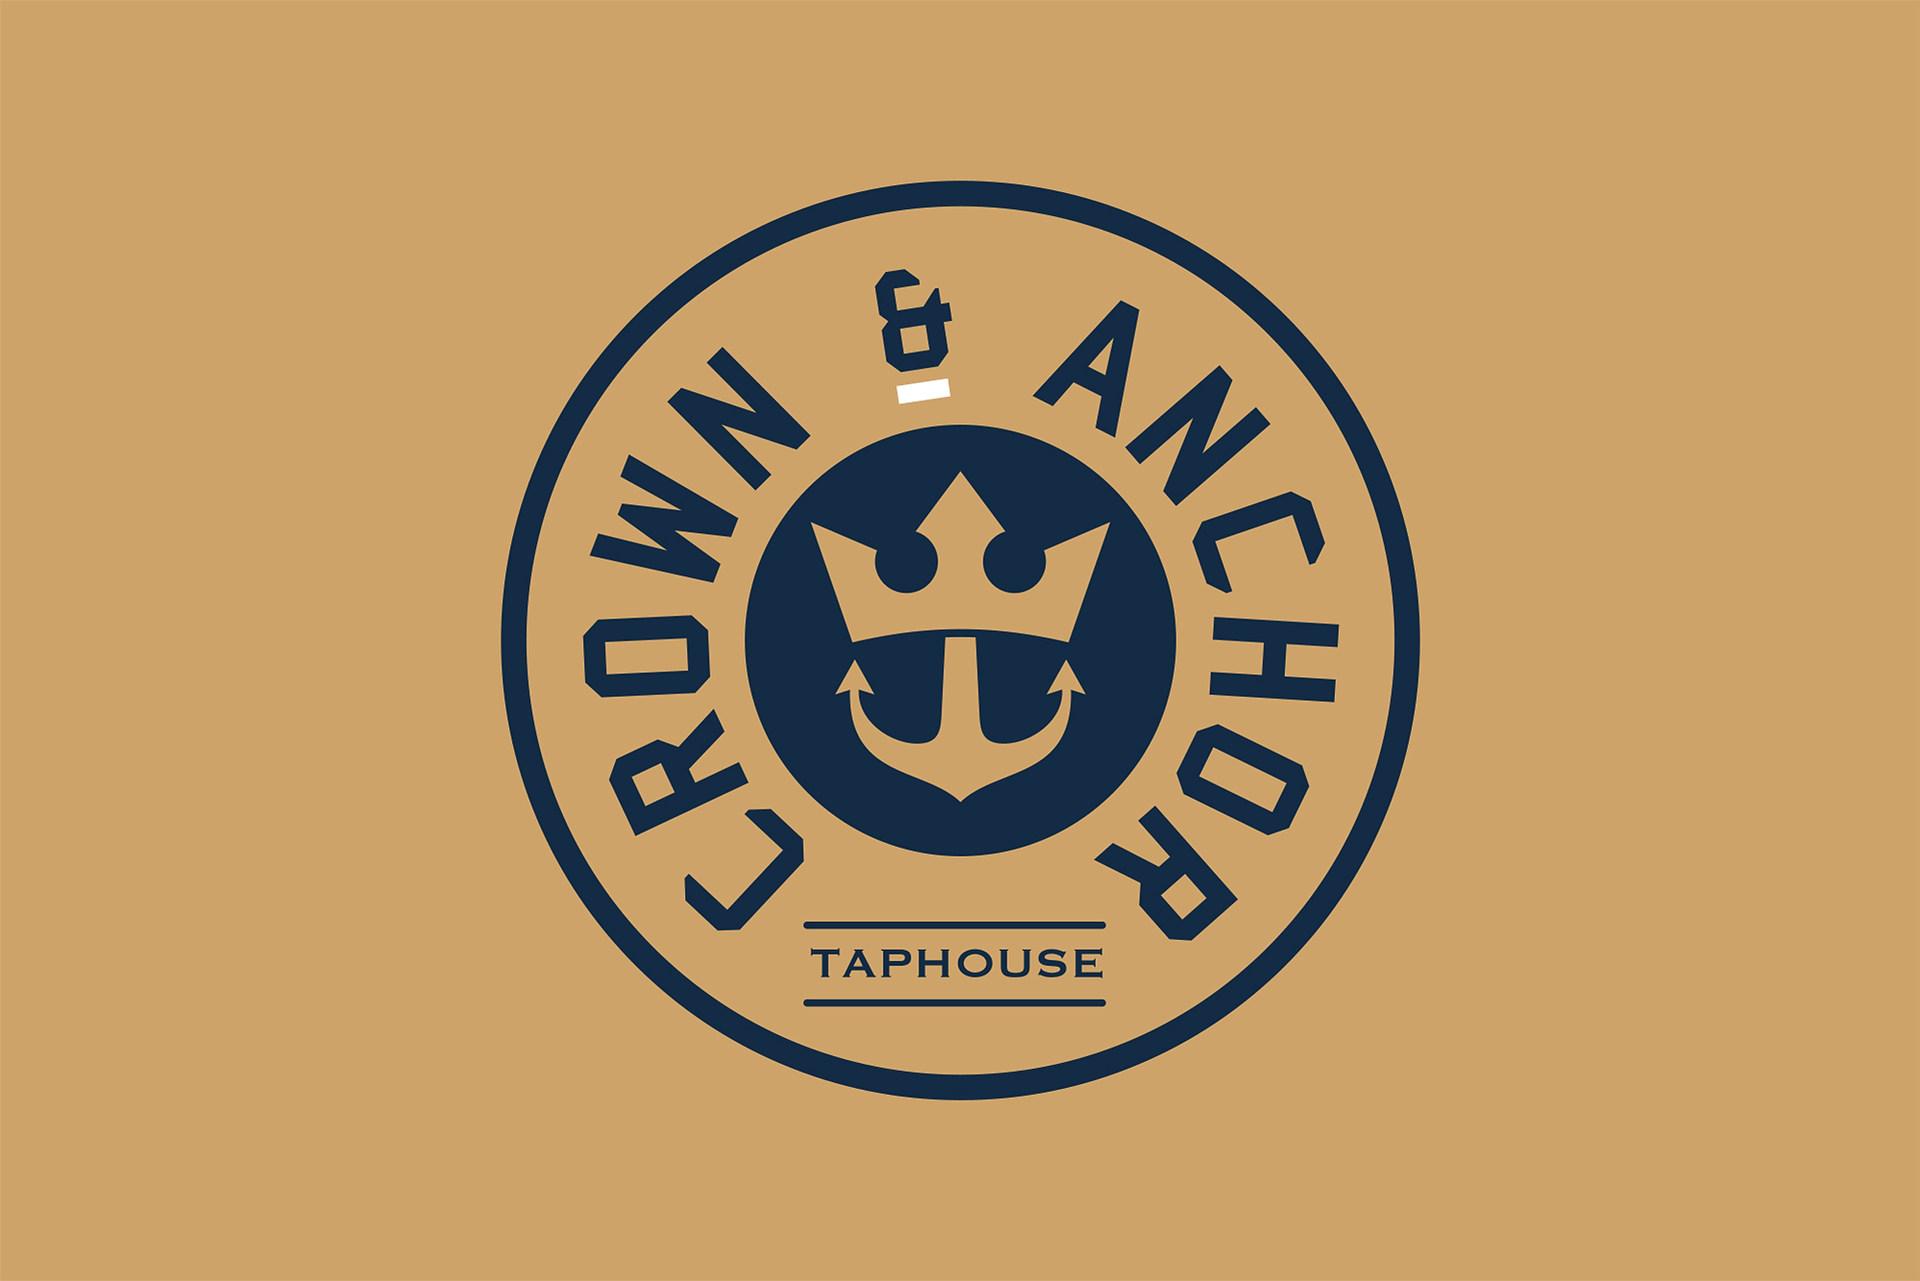 crown-&-Anchor-logo20-copy-5.jpg